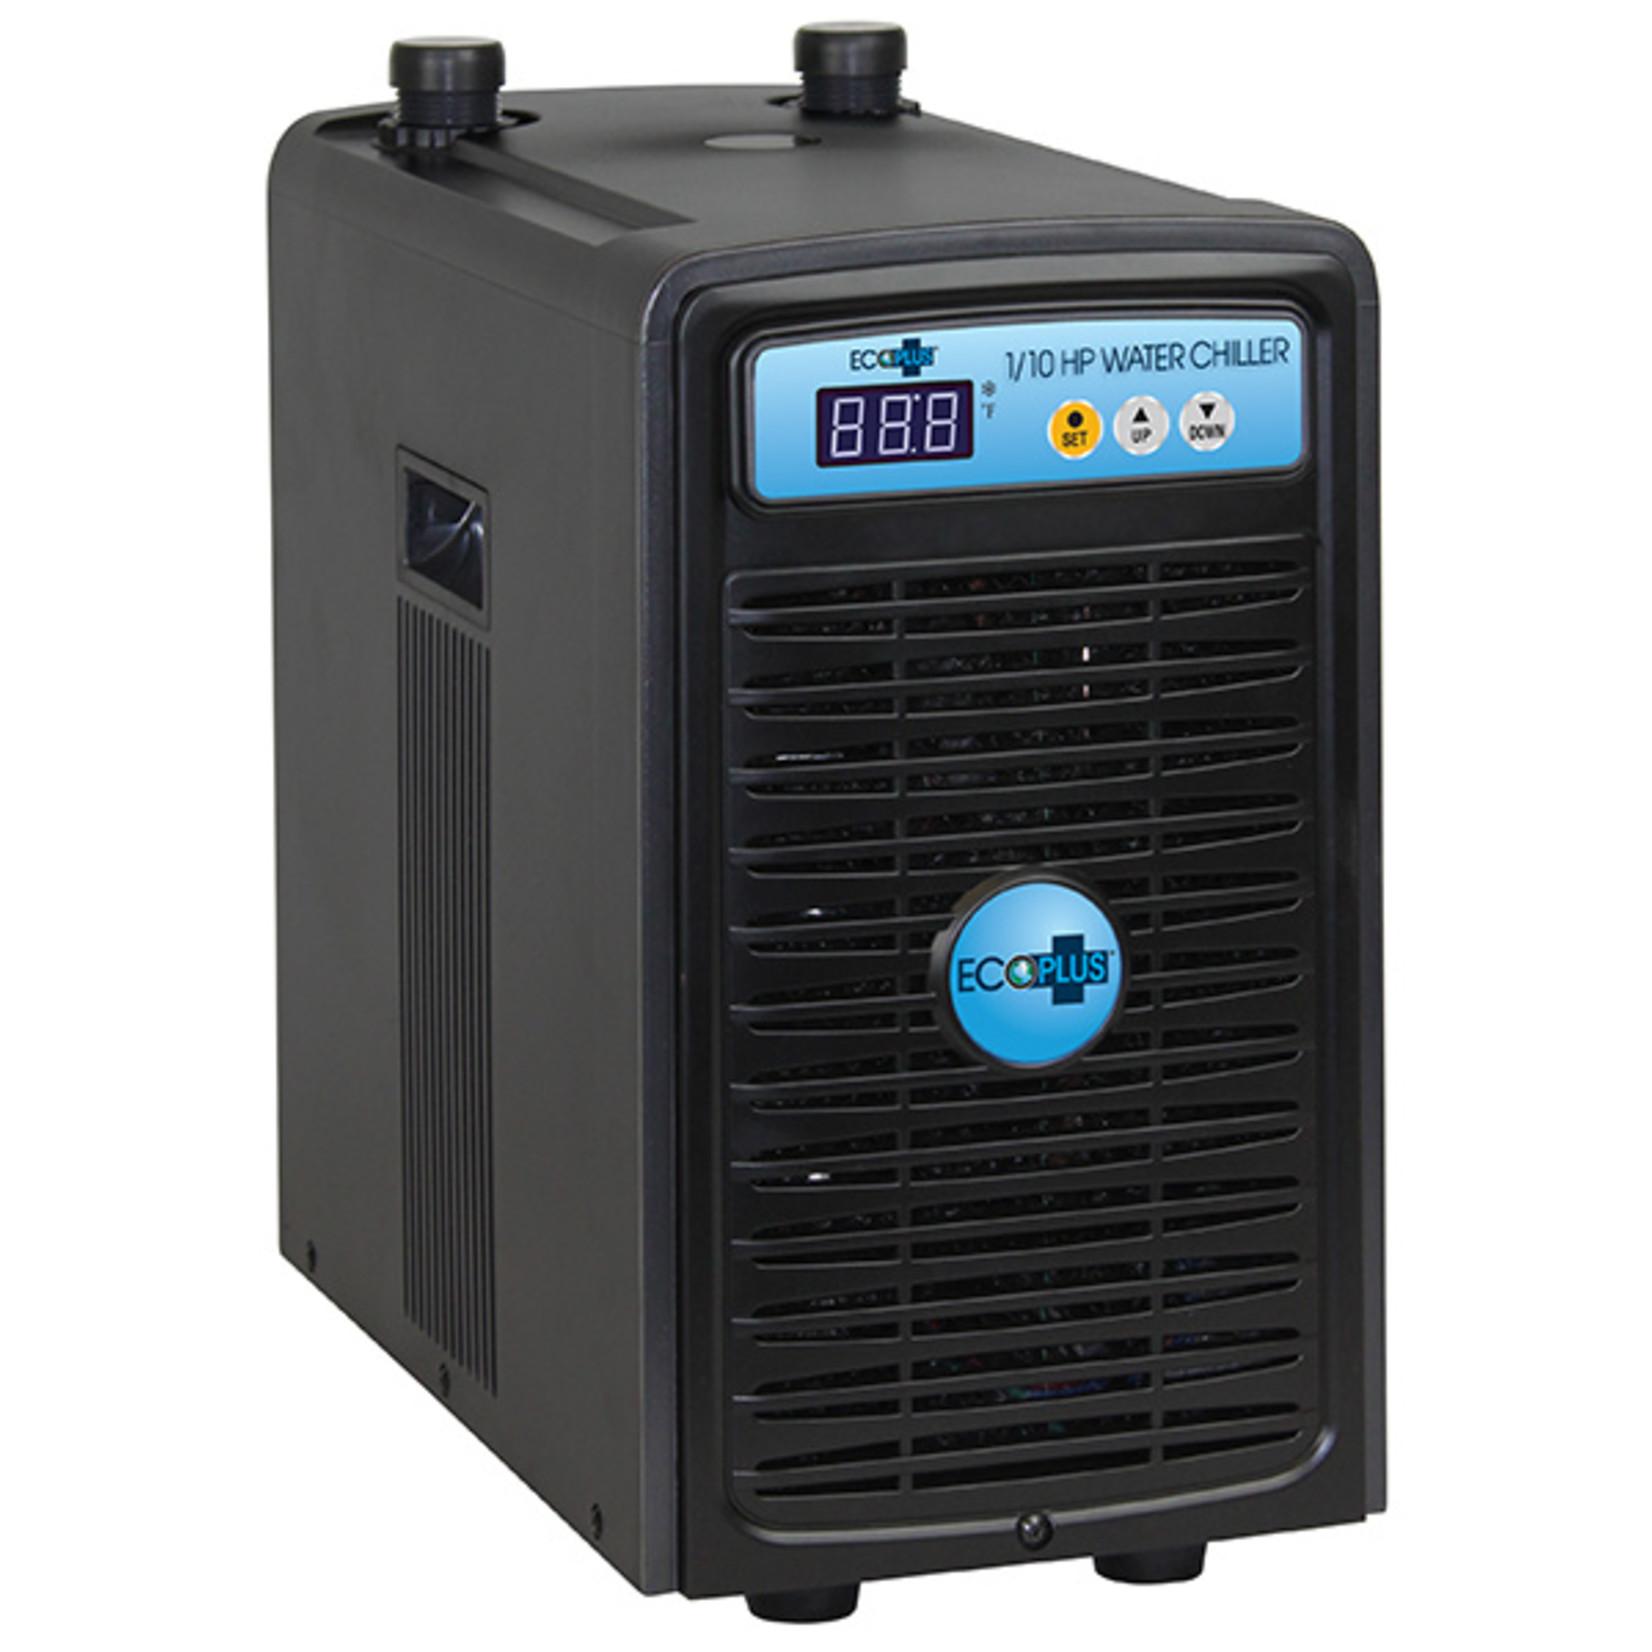 Ecoplus EcoPlus 1/10 HP Chiller